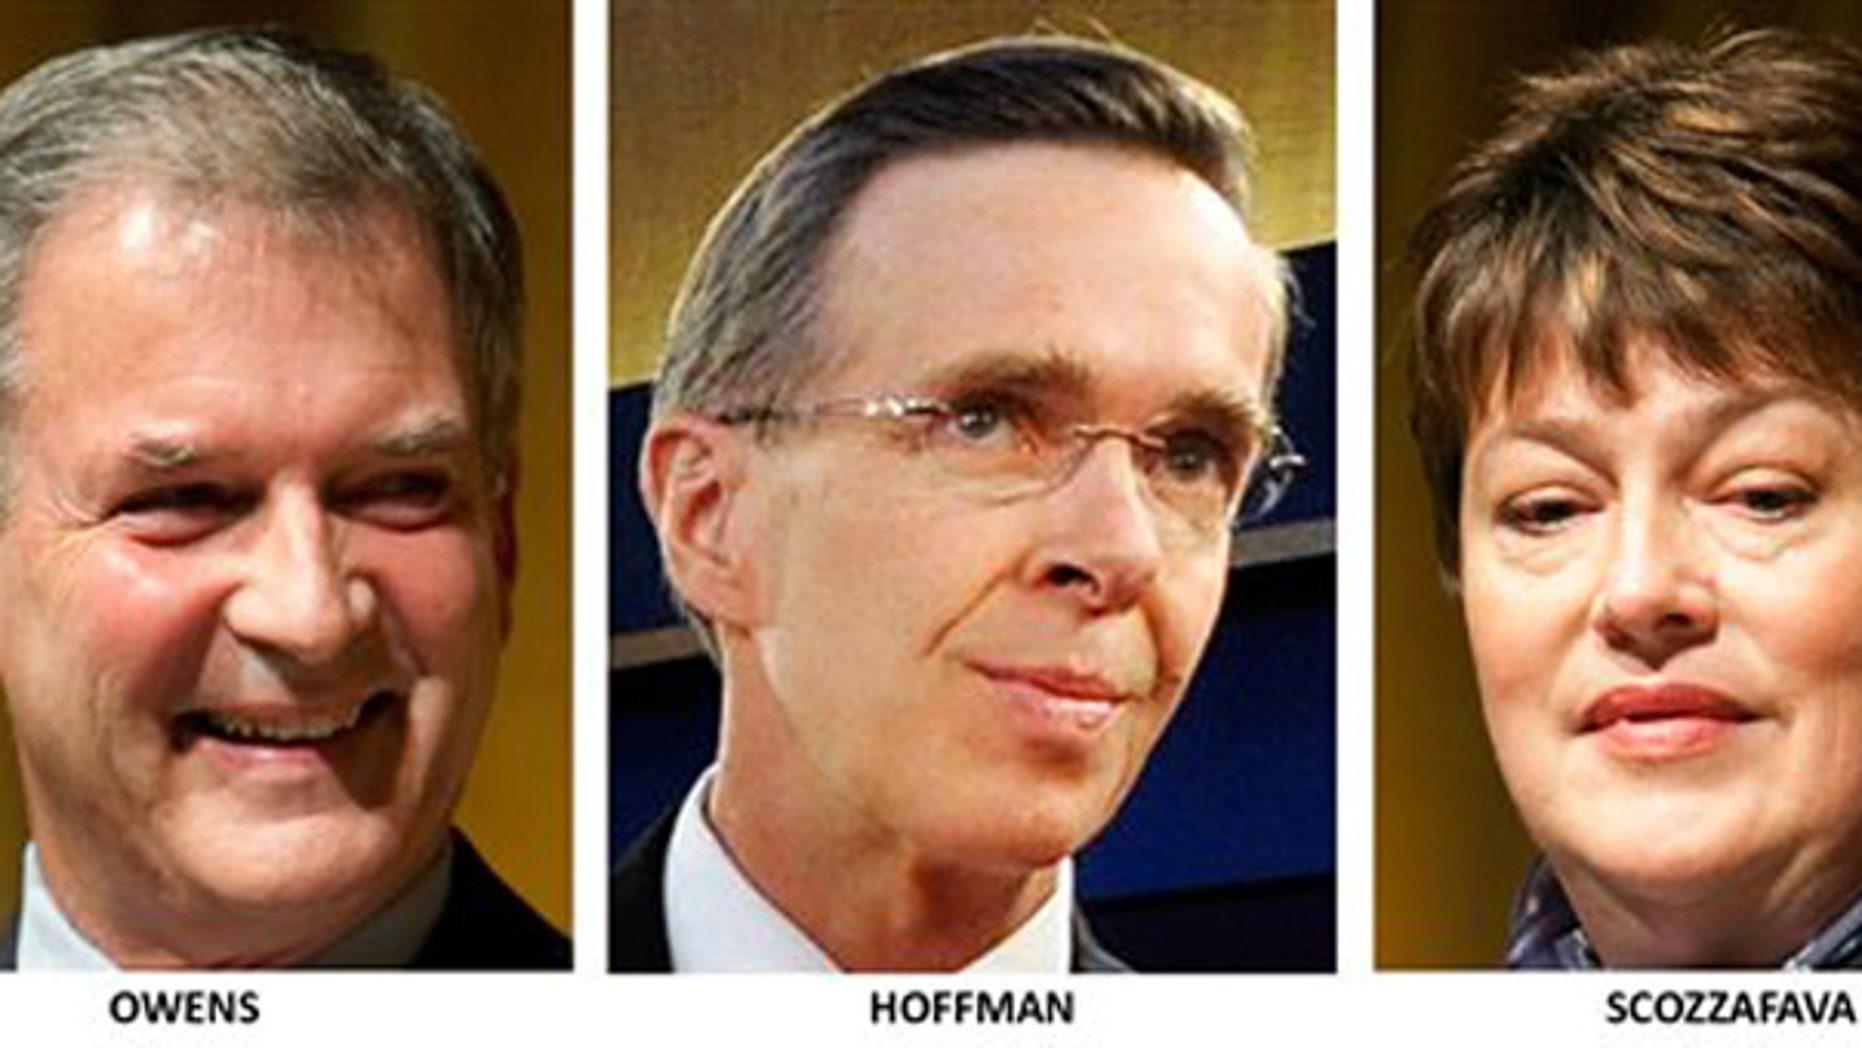 Congressional candidates in New York's 23rd district: Democrat Bill Owens, Conservative Party Dan Hoffman, and Republican Dede Scozzafava. (AP)